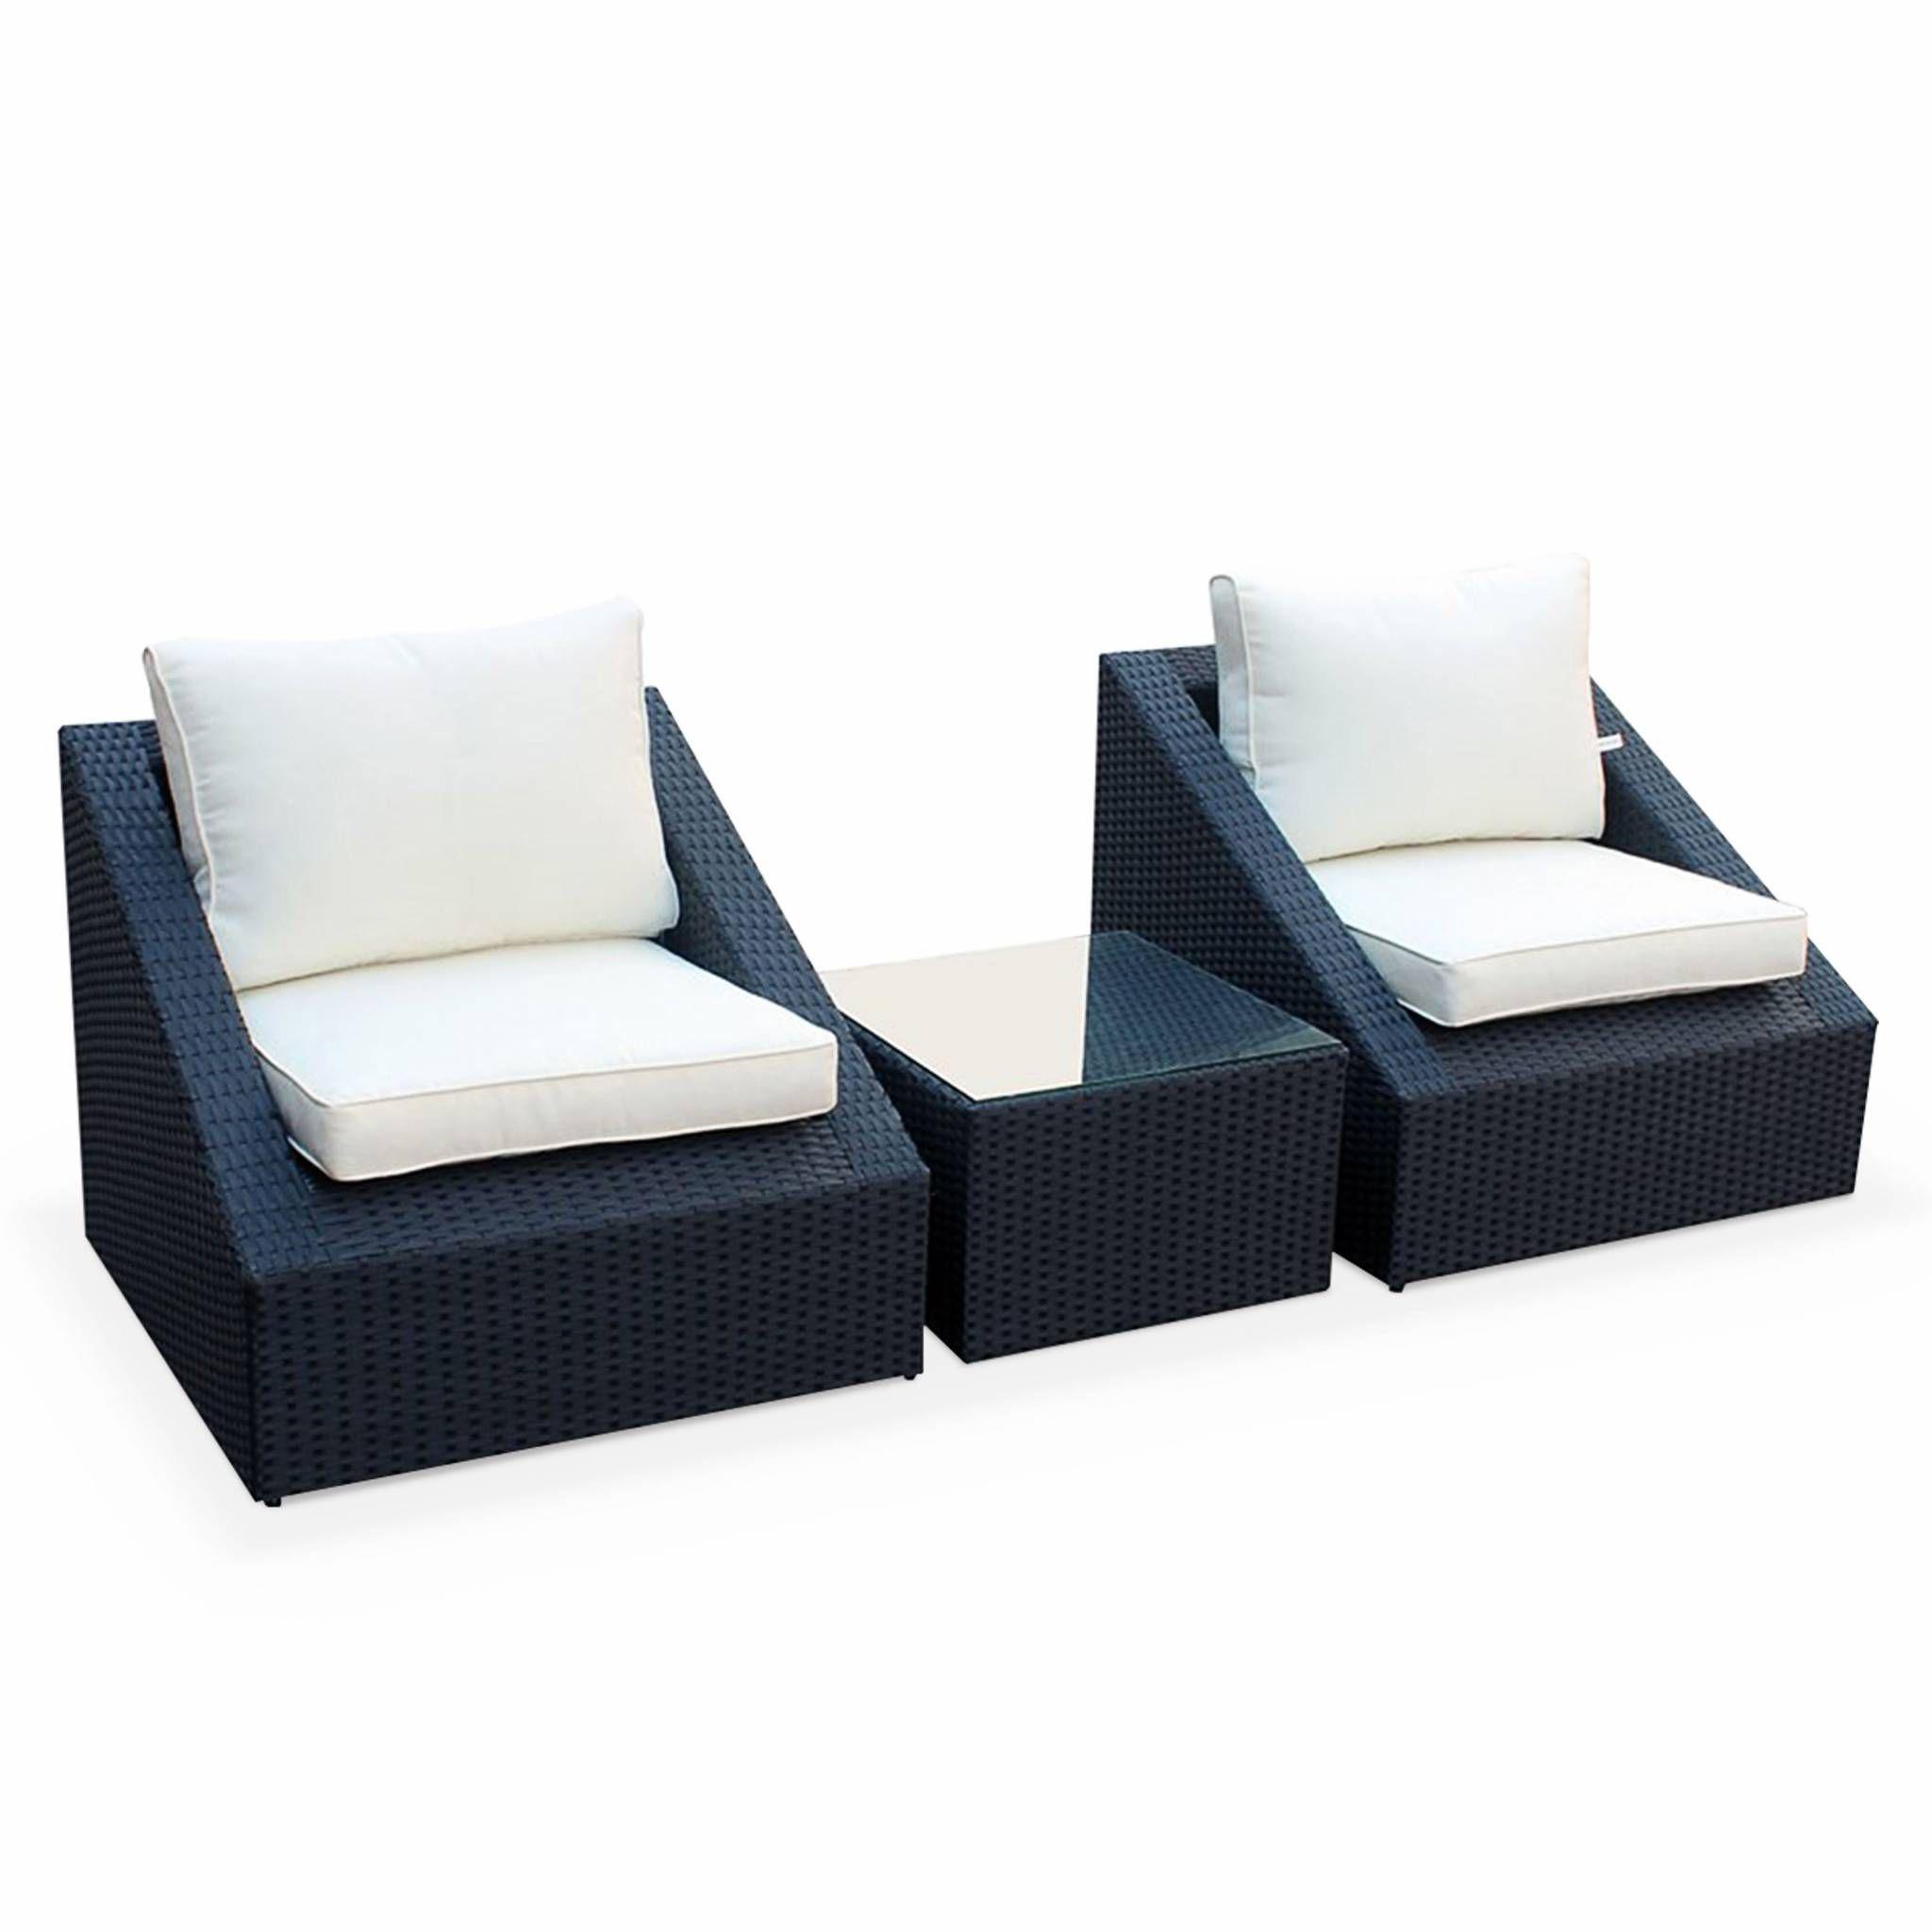 Colorisnoir de jardin fauteuils1 table Résine GARDEN tressée 2 Salon ALICE'S basse Empilables WE9eD2HIY